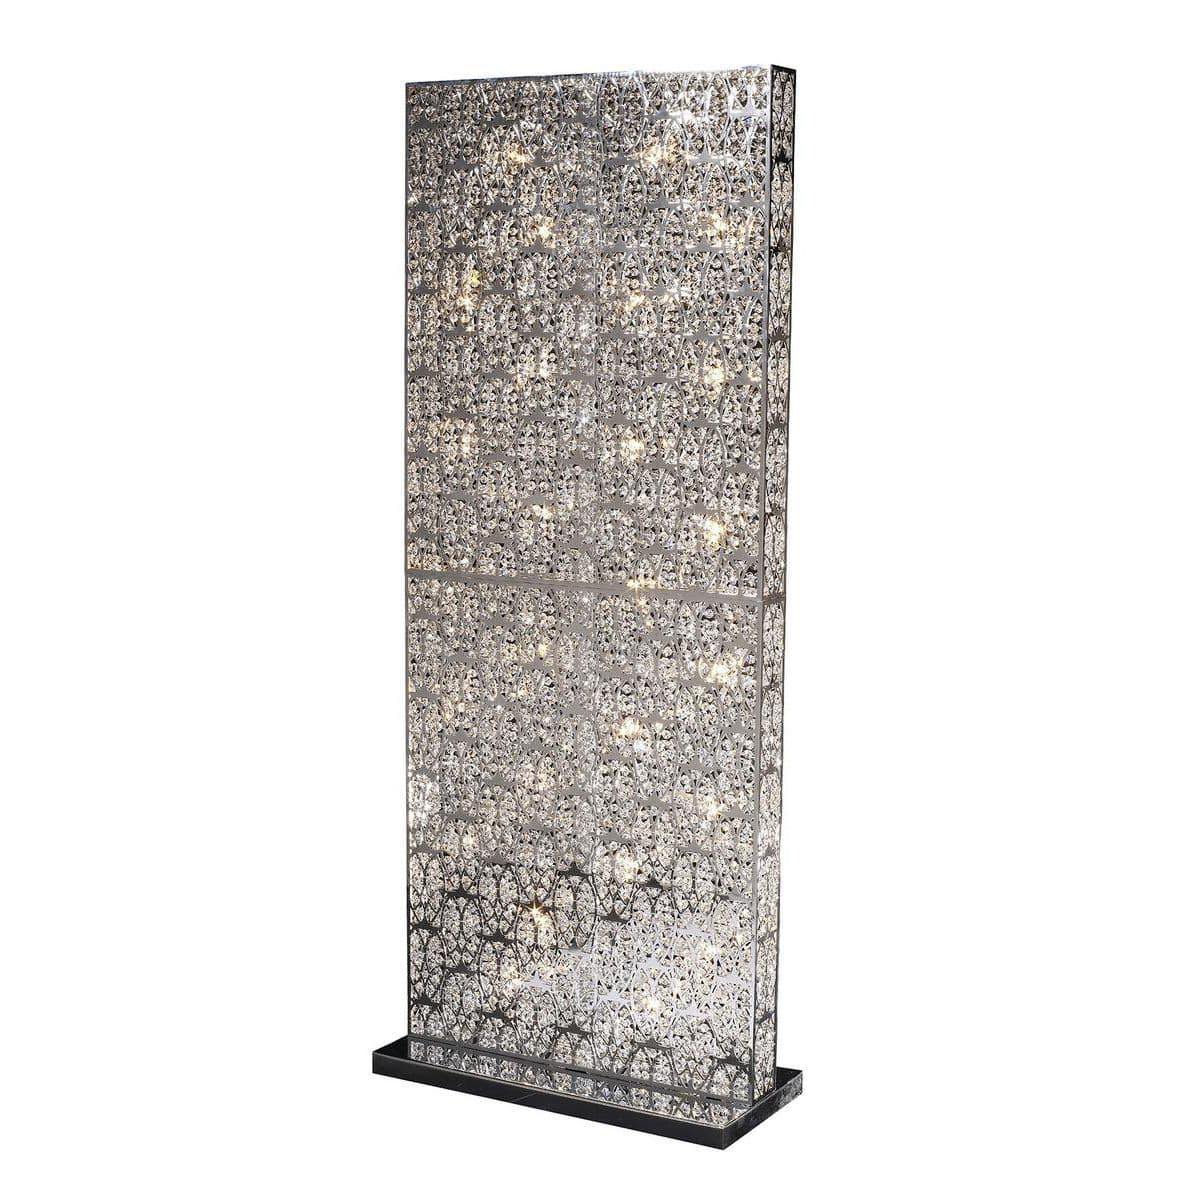 floor-standing lamp / original design / crystal / stainless steel ... - Larabesque Lampade